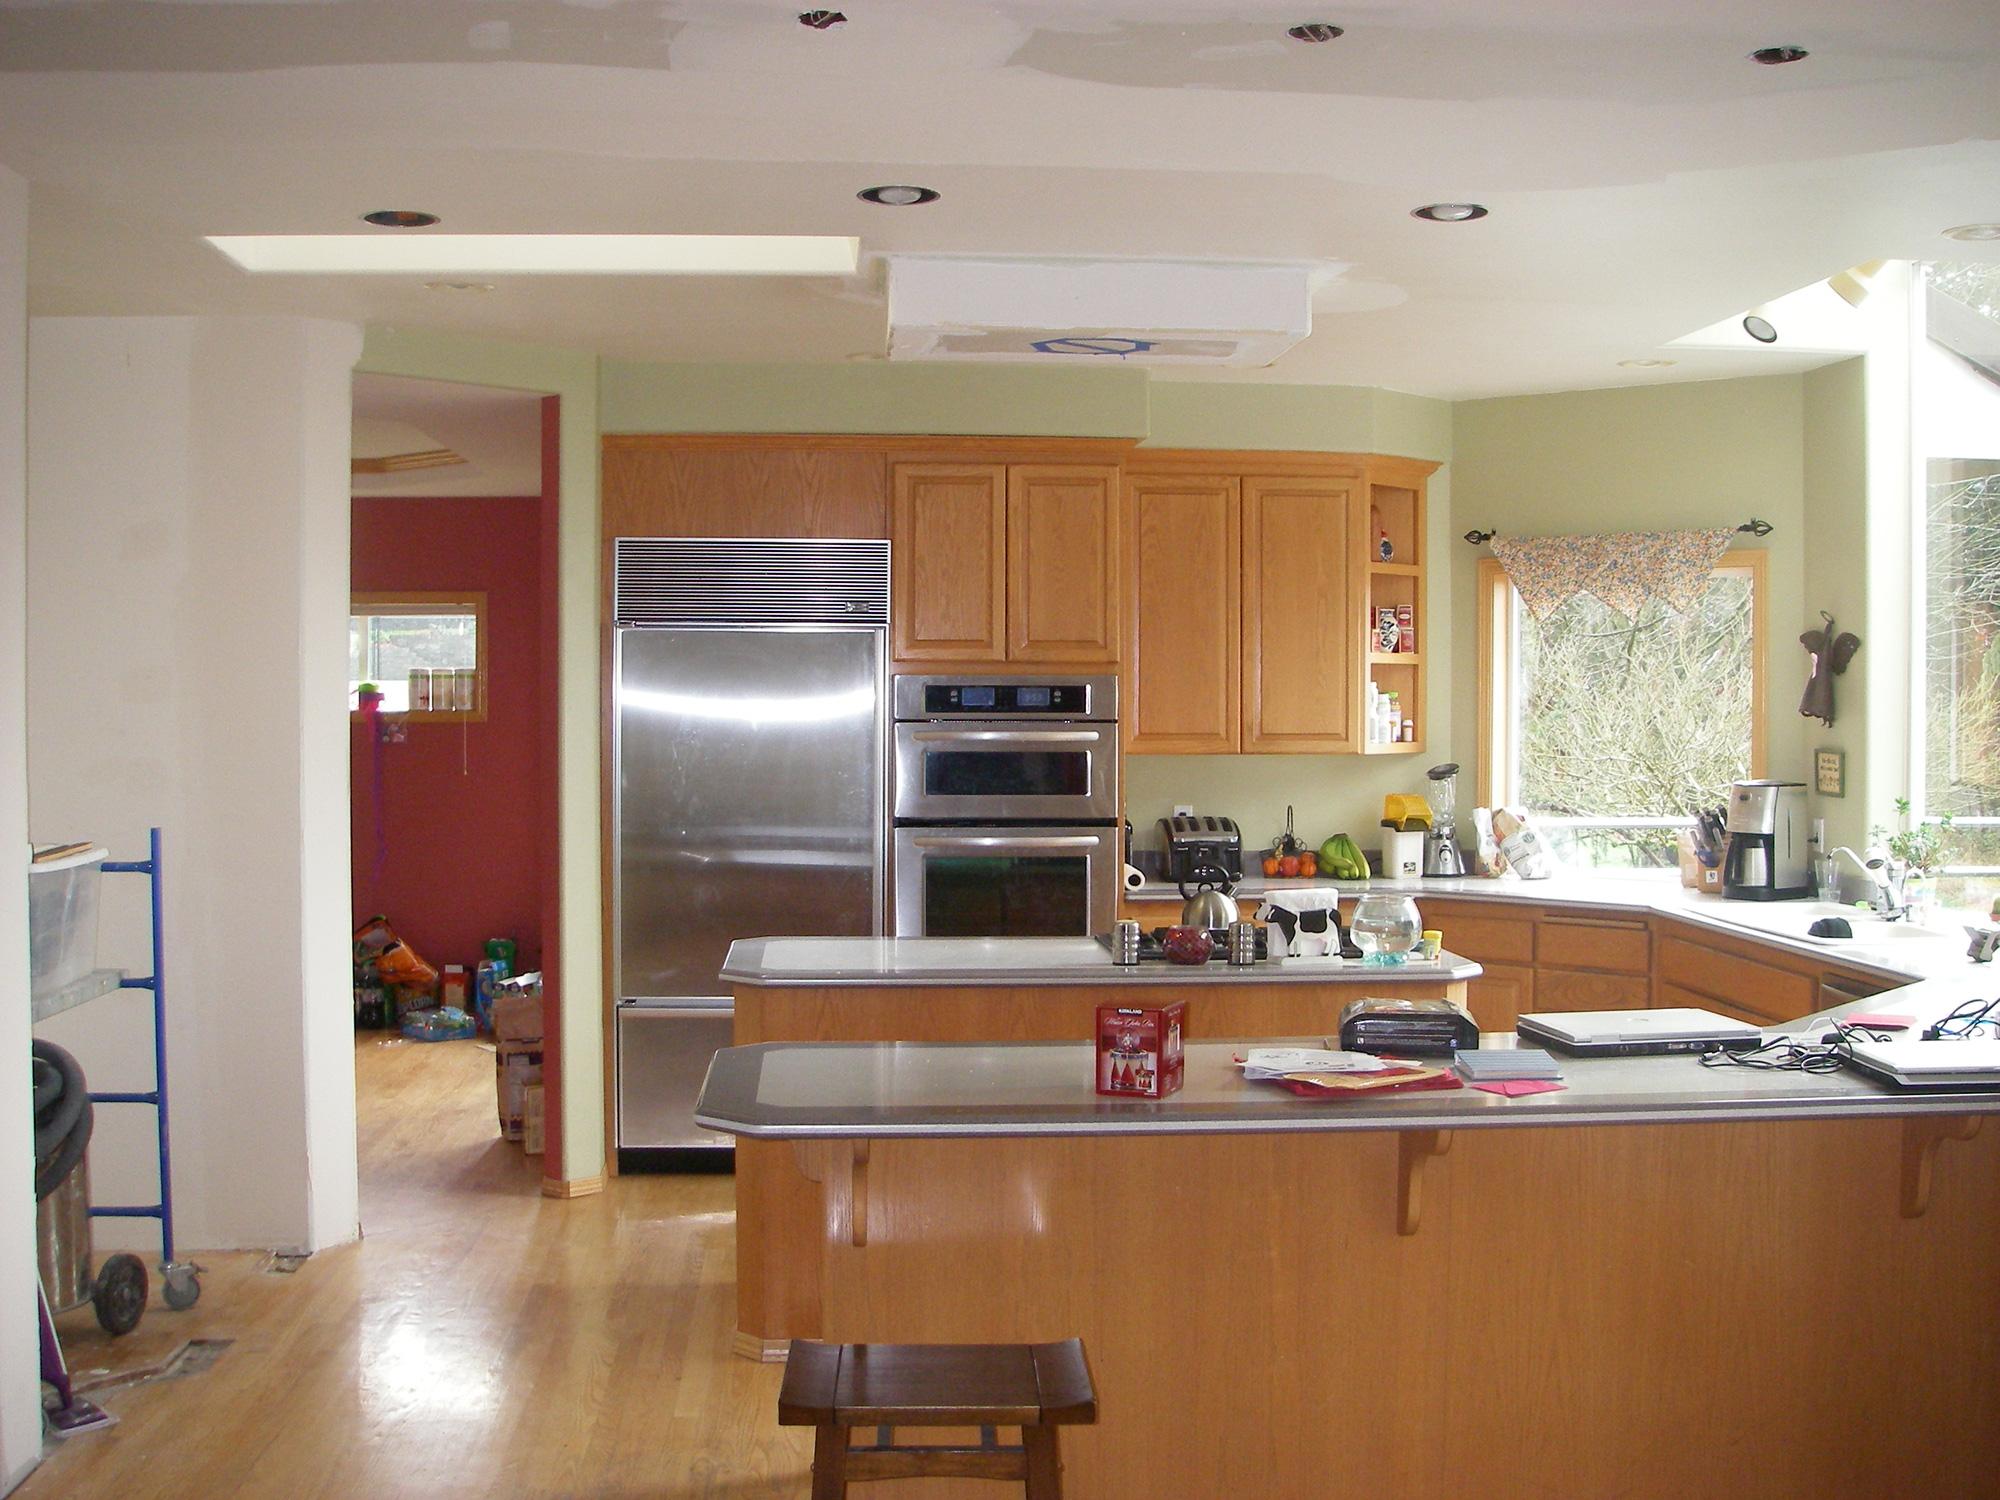 Before kitchen renovation